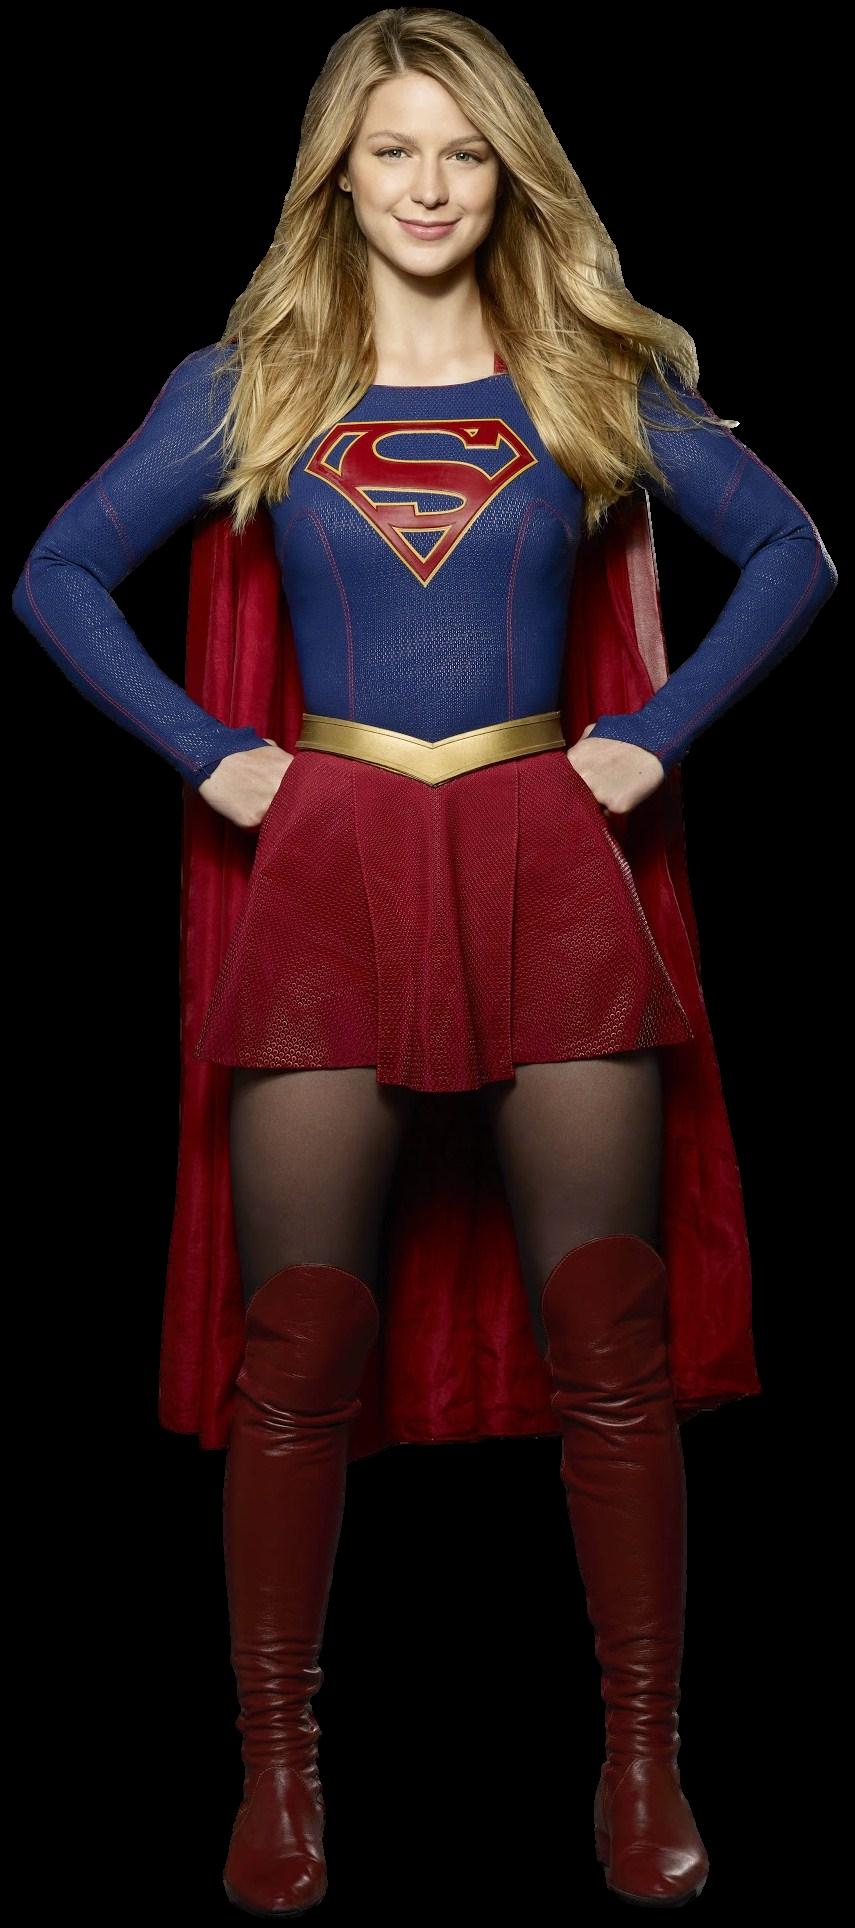 Supergirl PNG - 21668